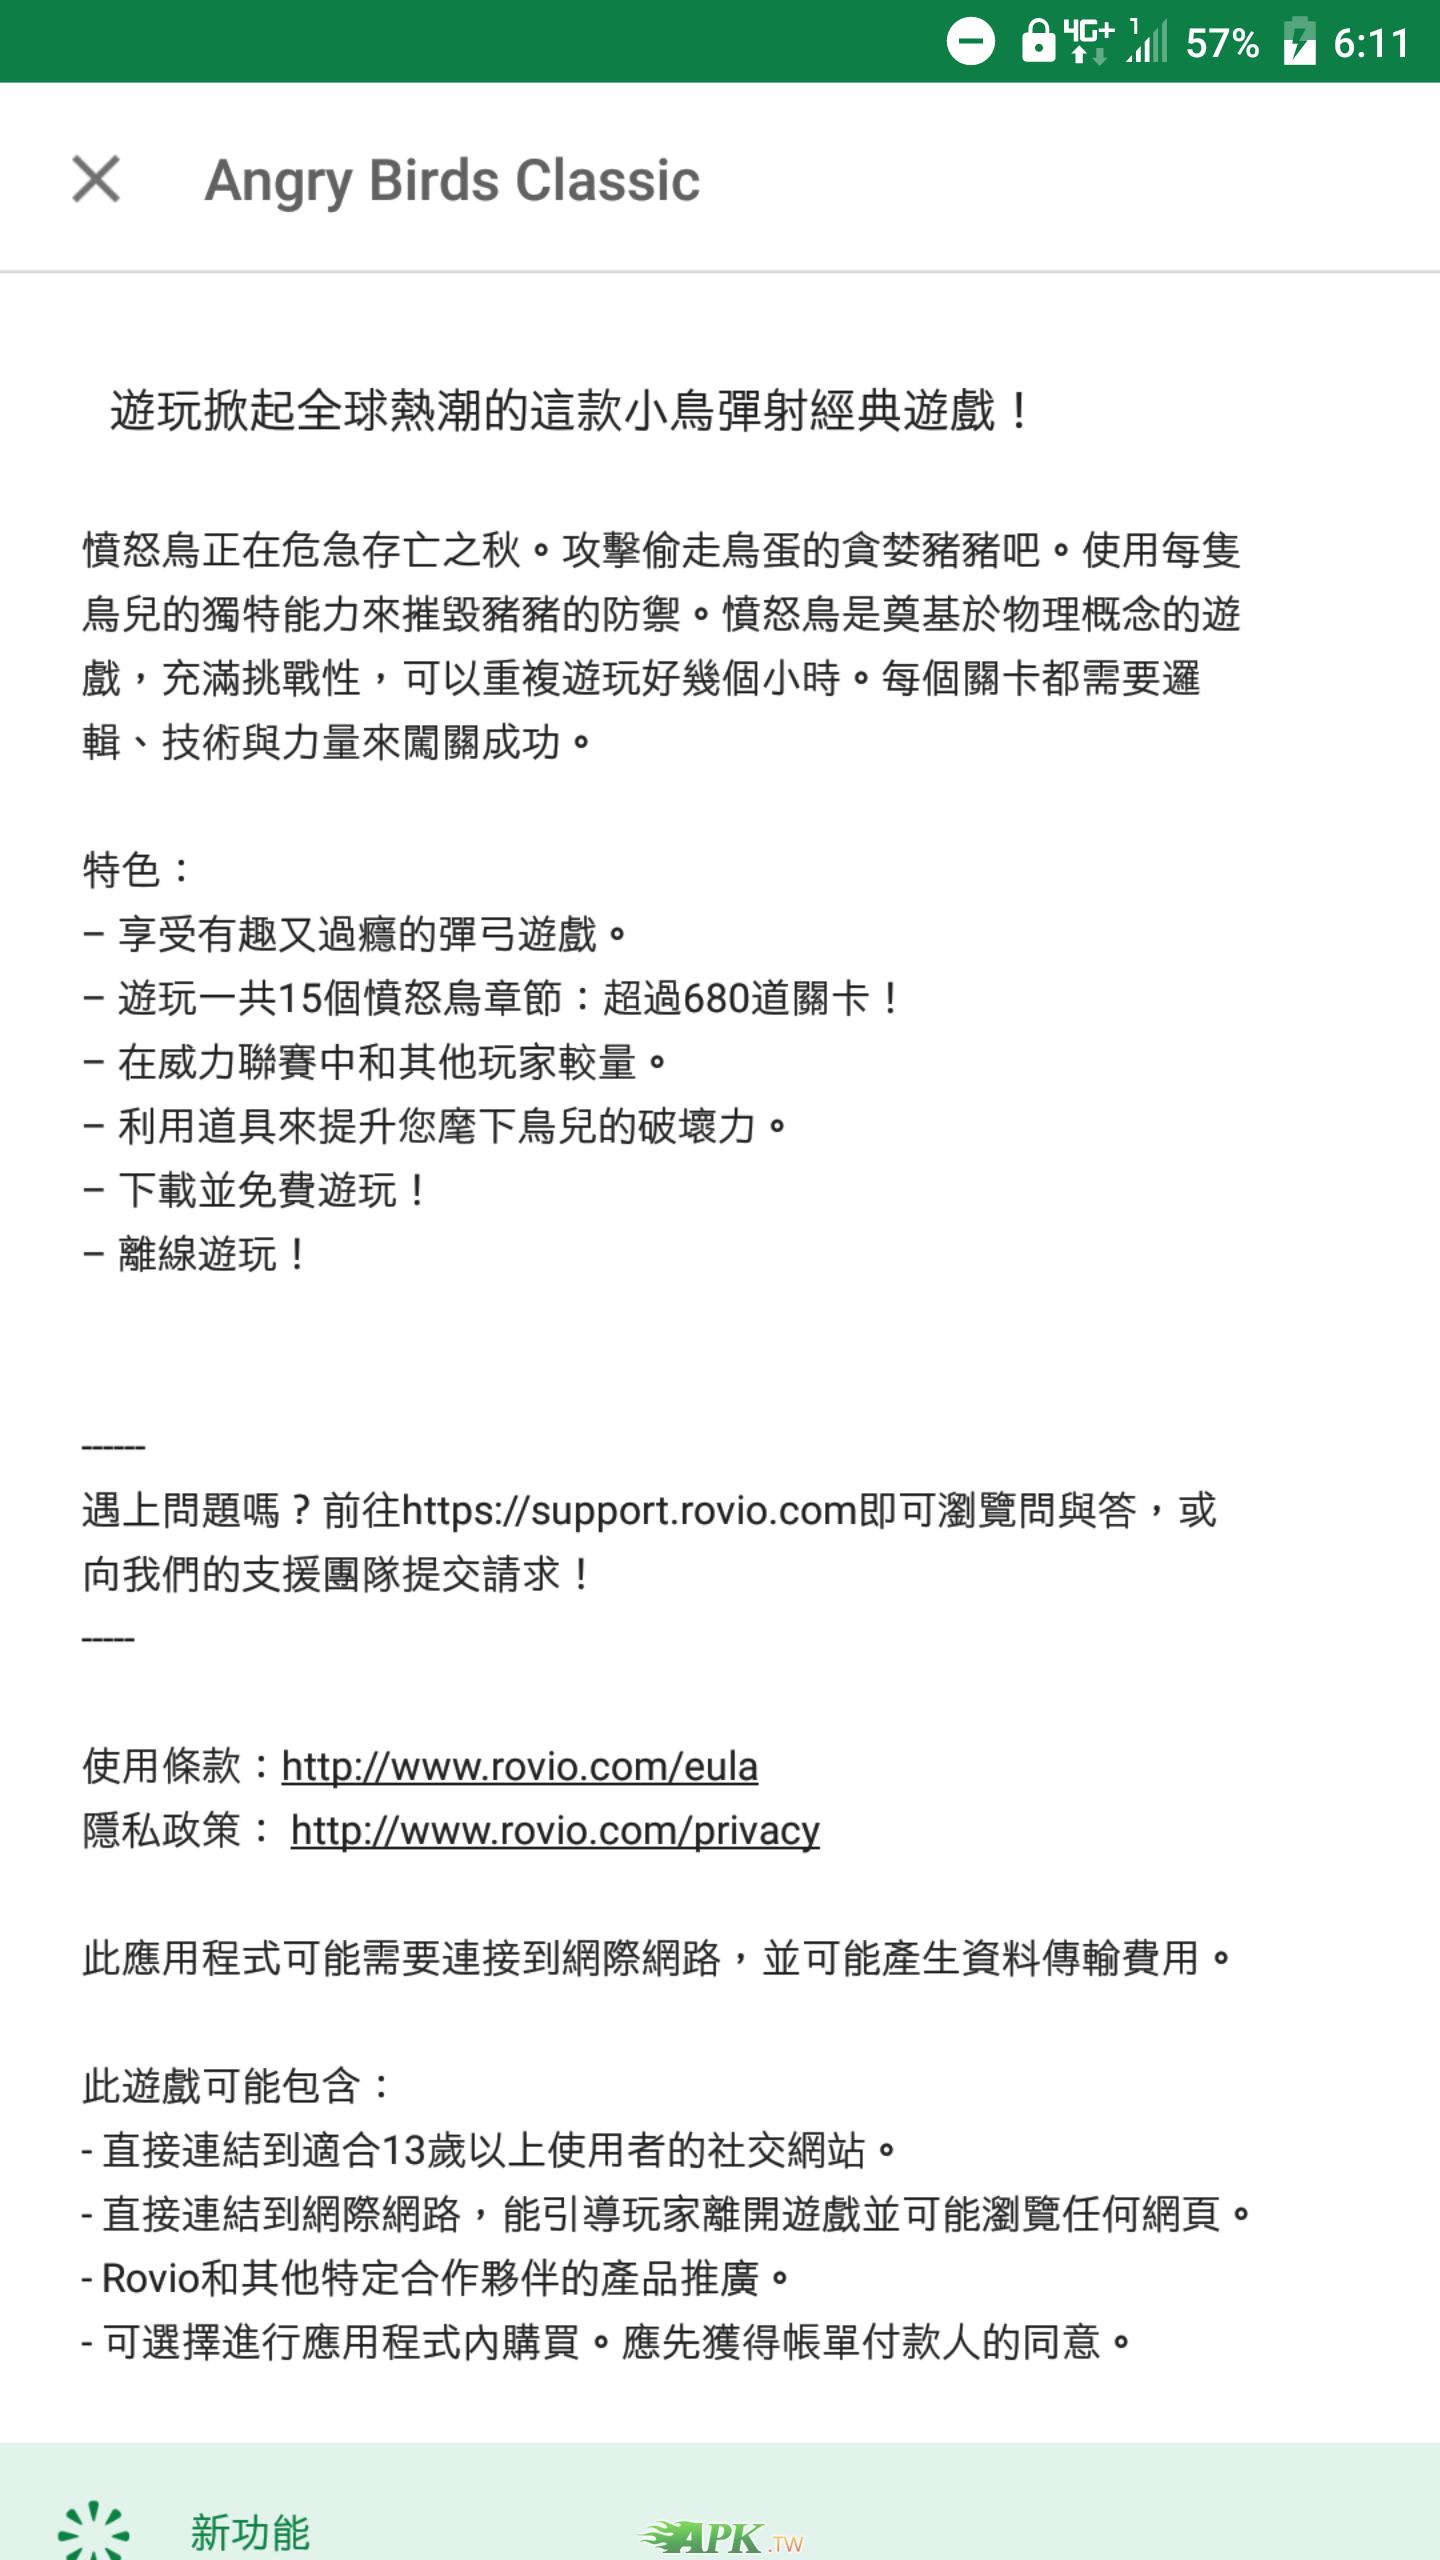 Screenshot_20181206-181132.png